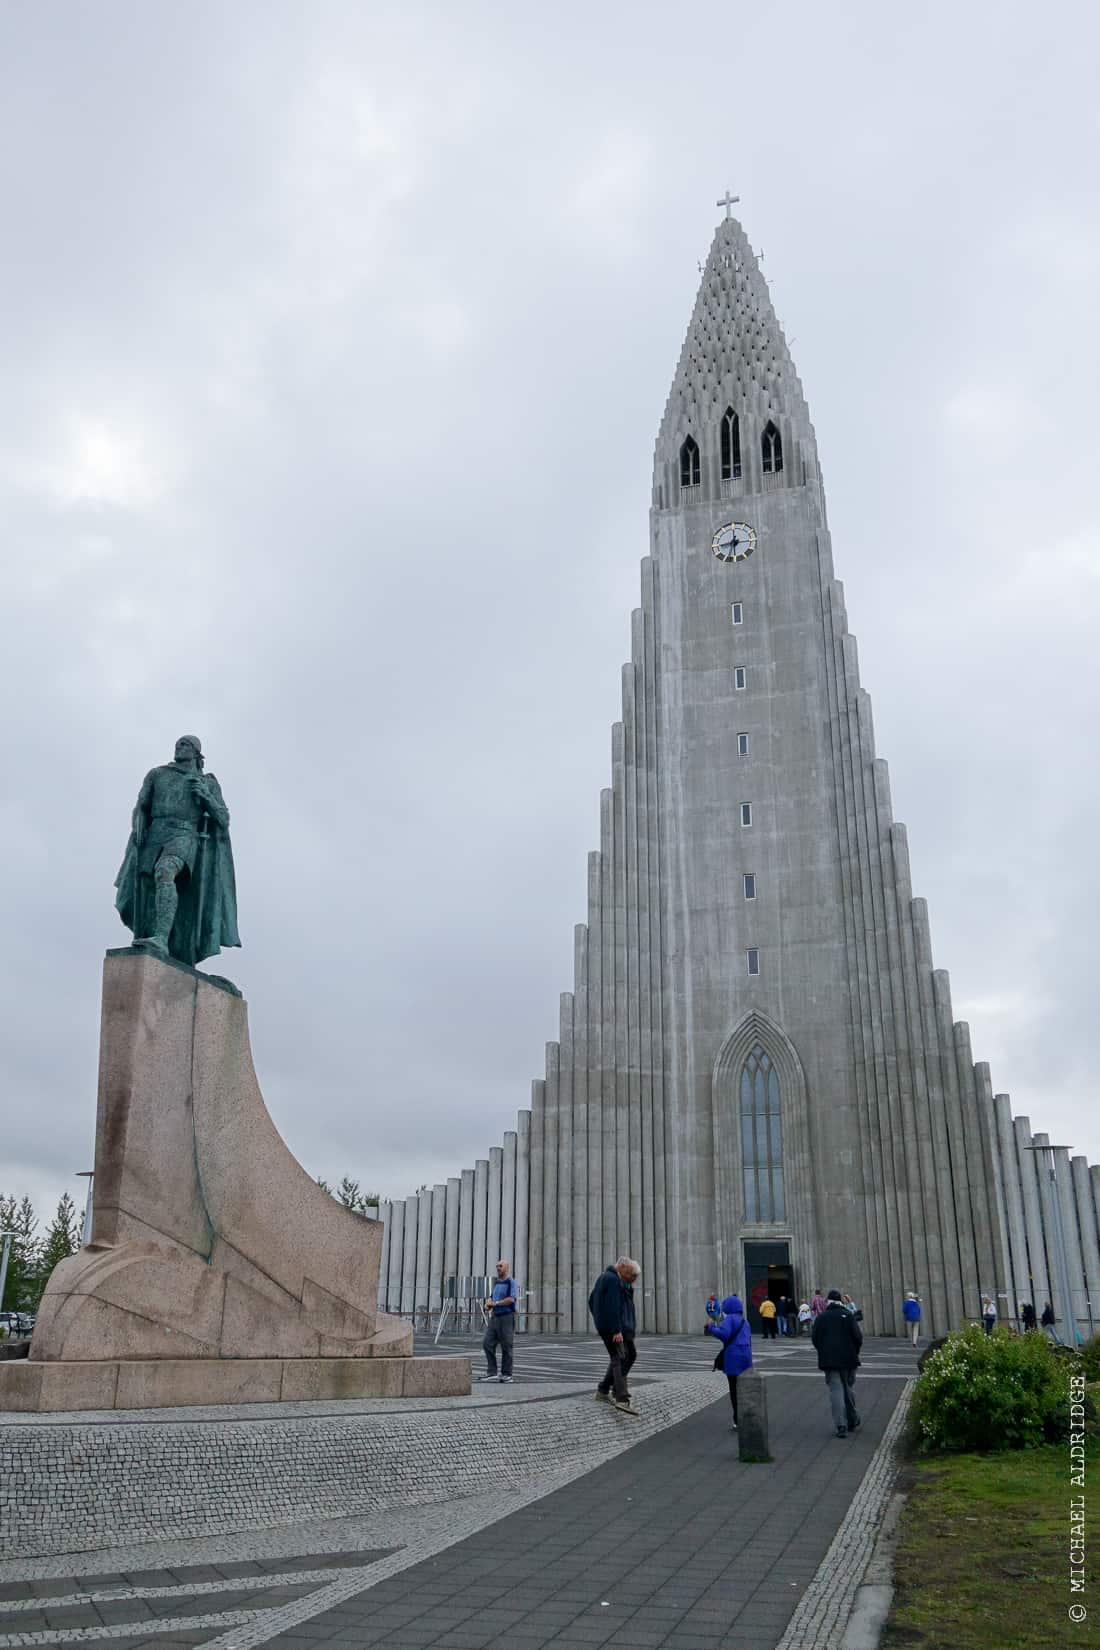 HallgrímskirkjaChruch in Reykjavik, Iceland